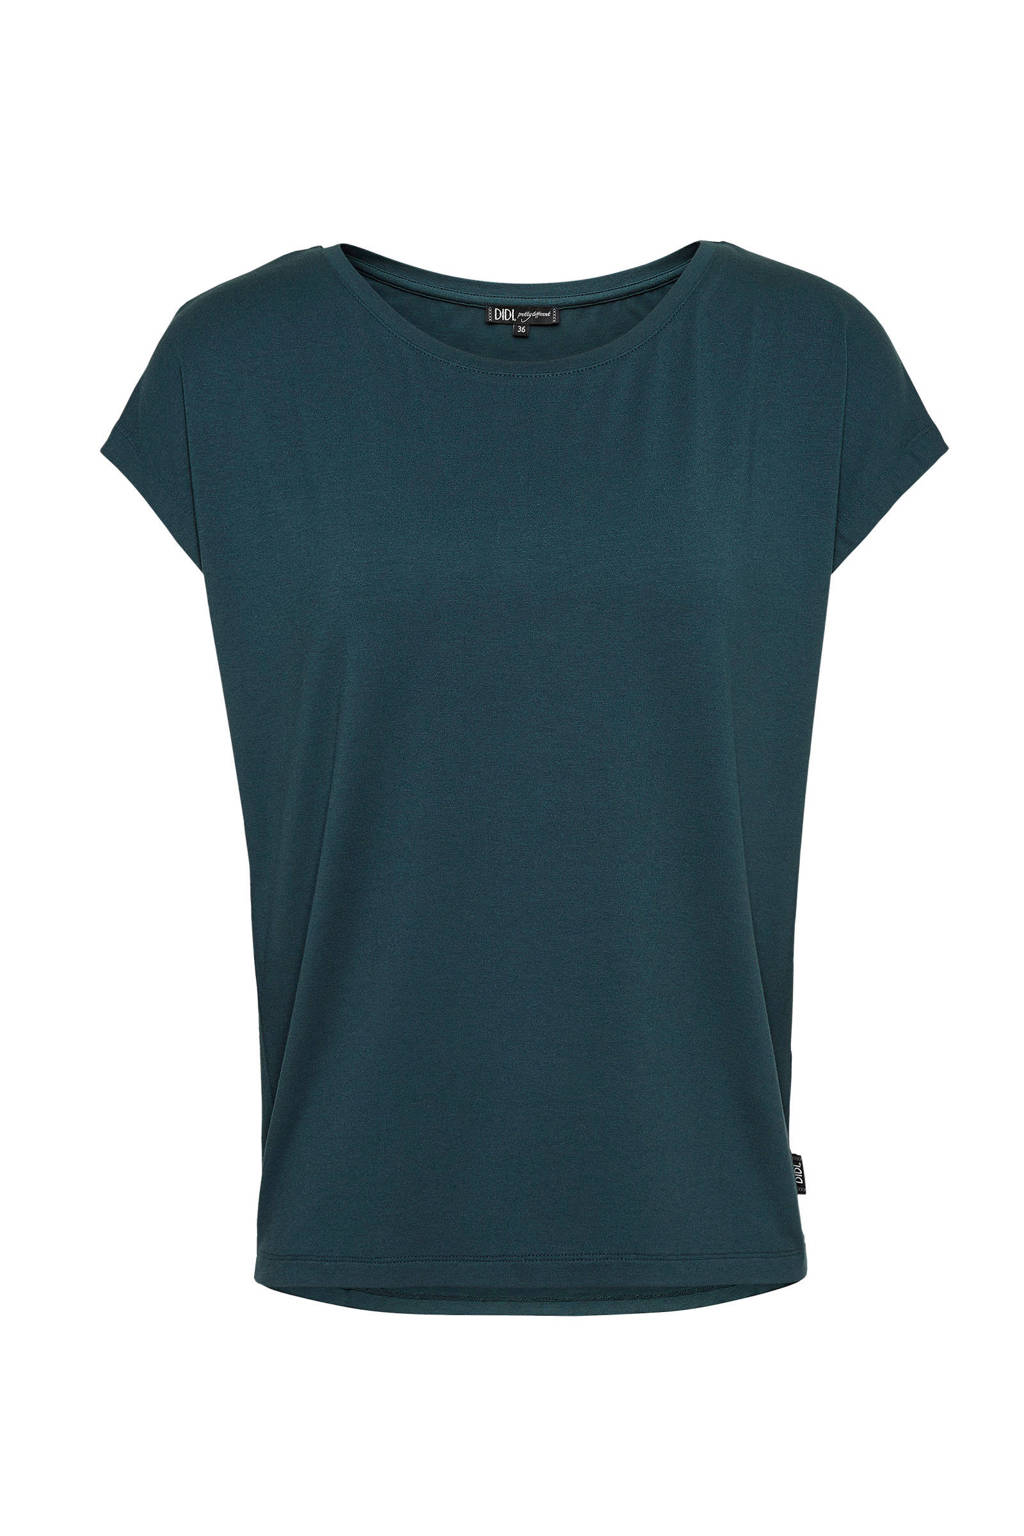 Didi T-shirt donkergroen, Donkergroen